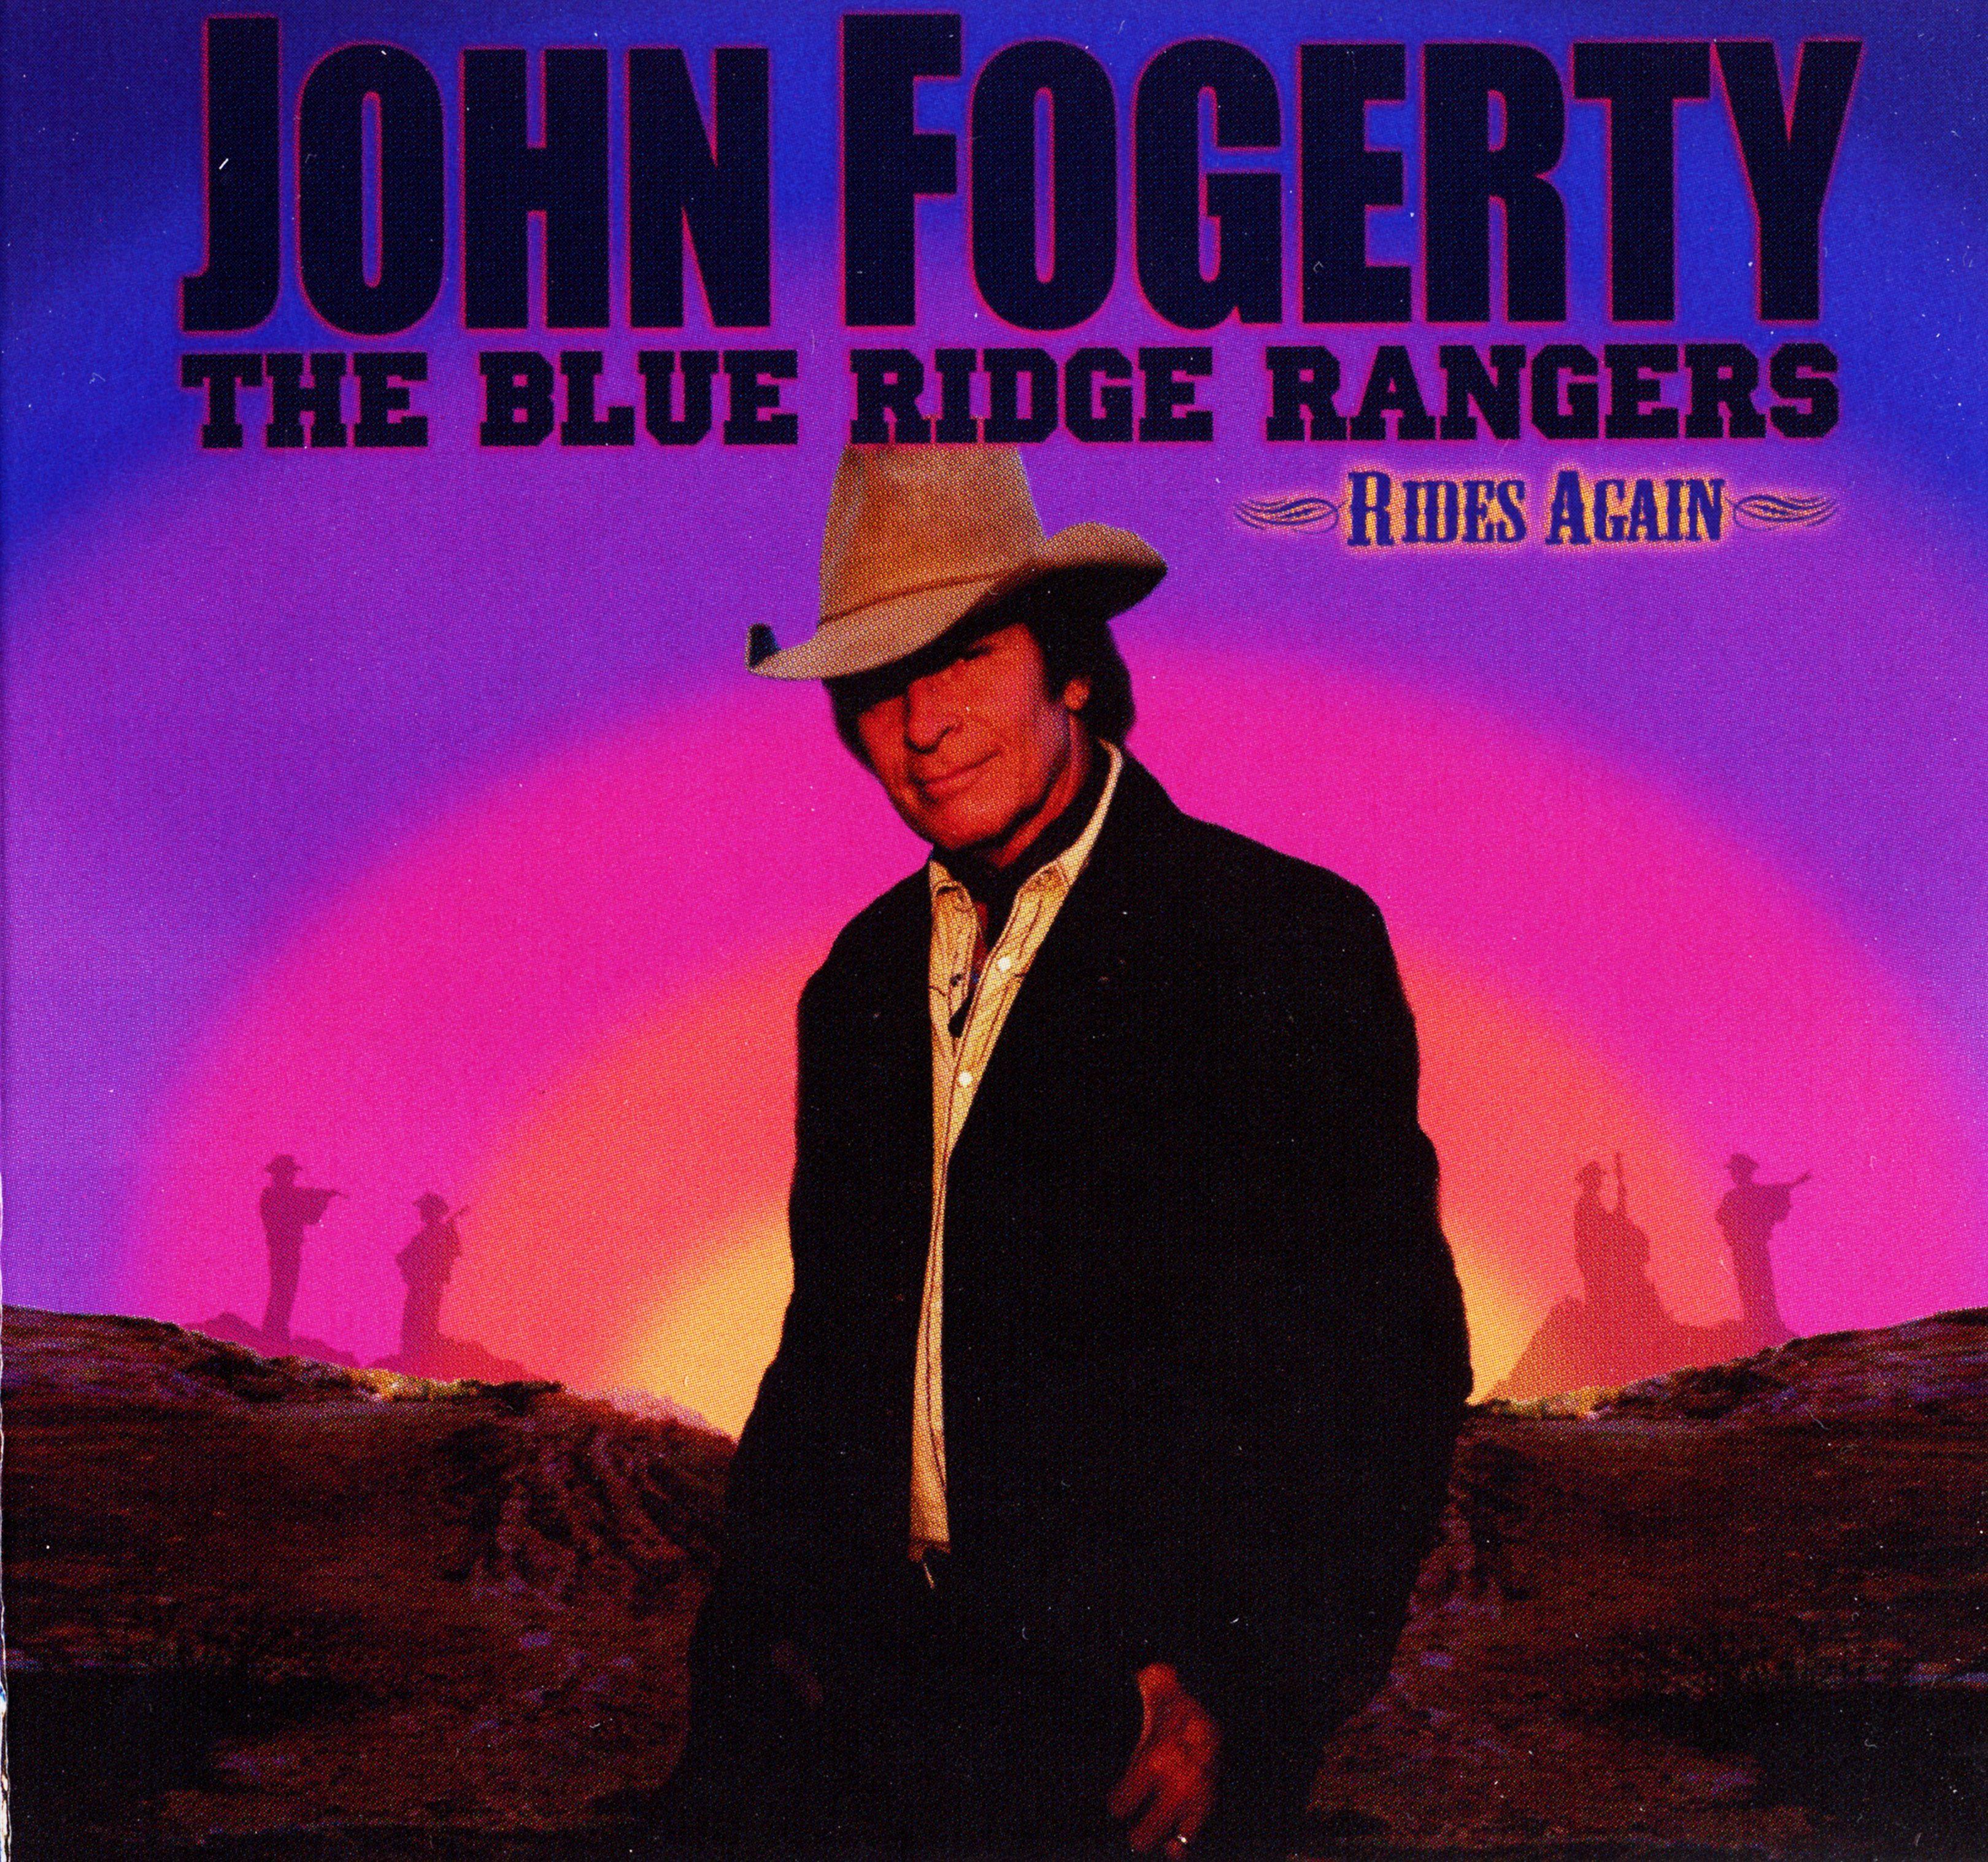 John Fogerty - The Blue Ridge Rangers Rides Again album cover